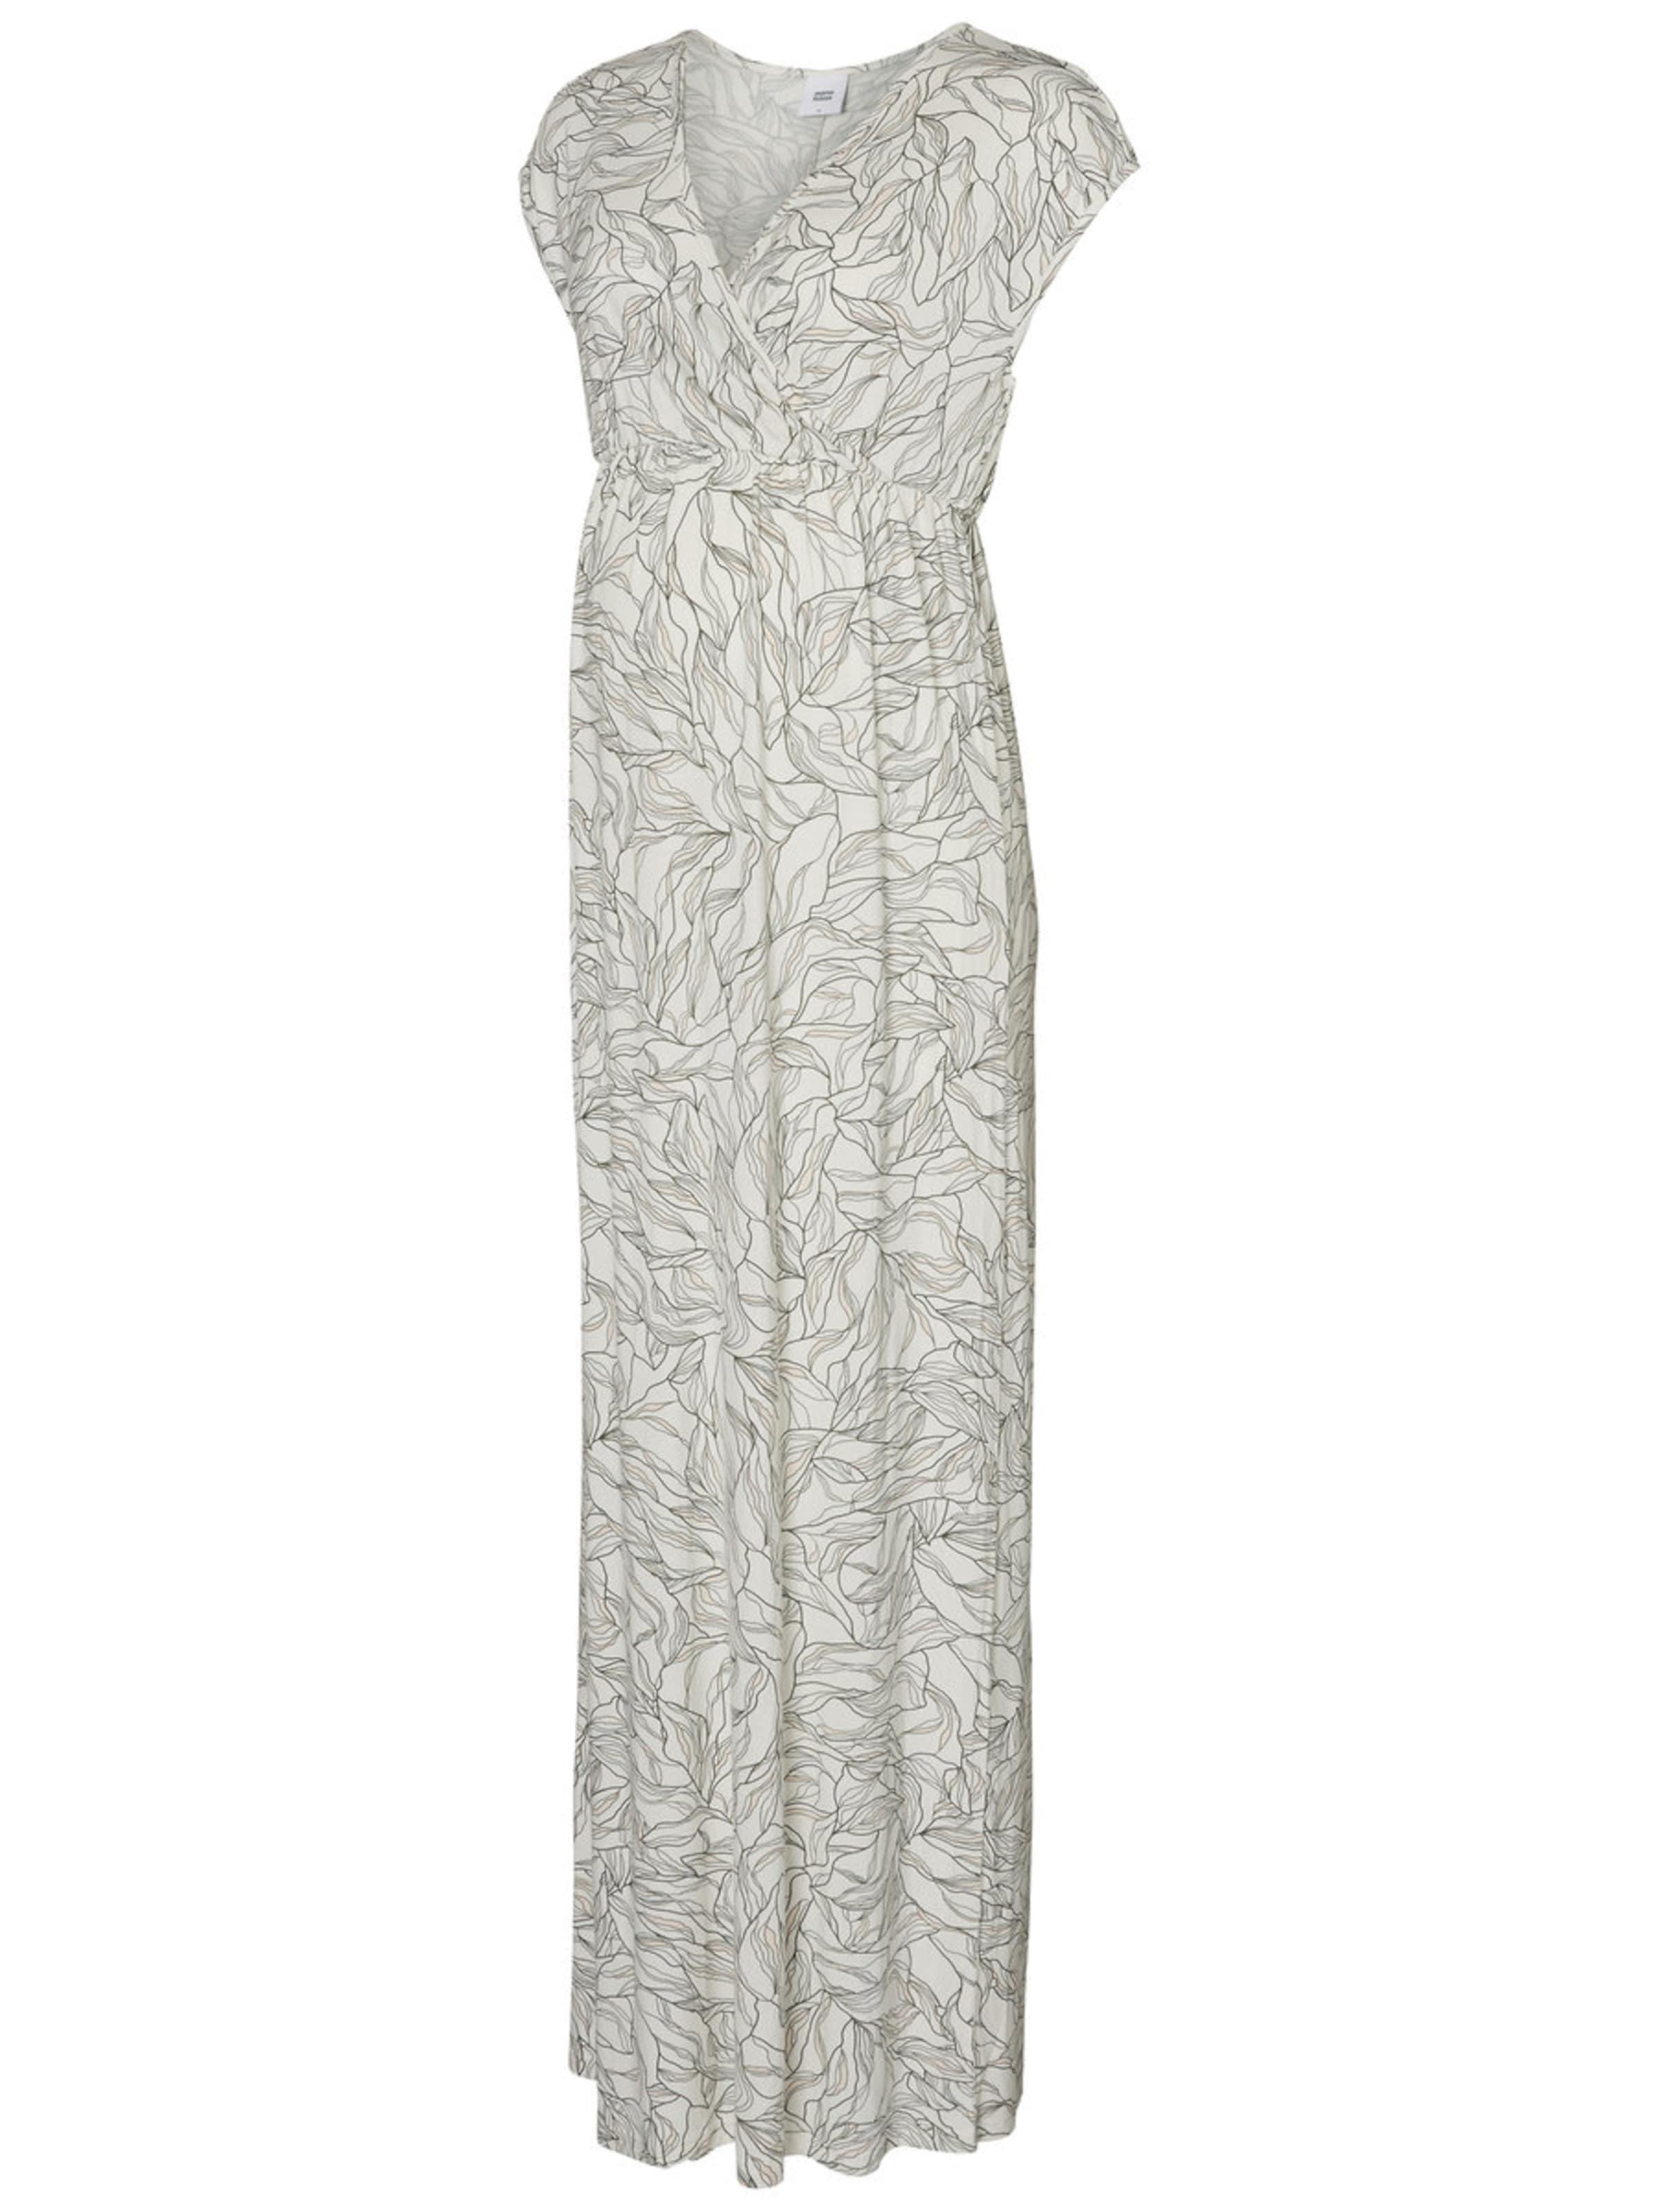 Rabatt Größte Lieferant Niedriger Versandverkauf Online MAMALICIOUS Bedrucktes Maxi Kleid UA5Vo7j